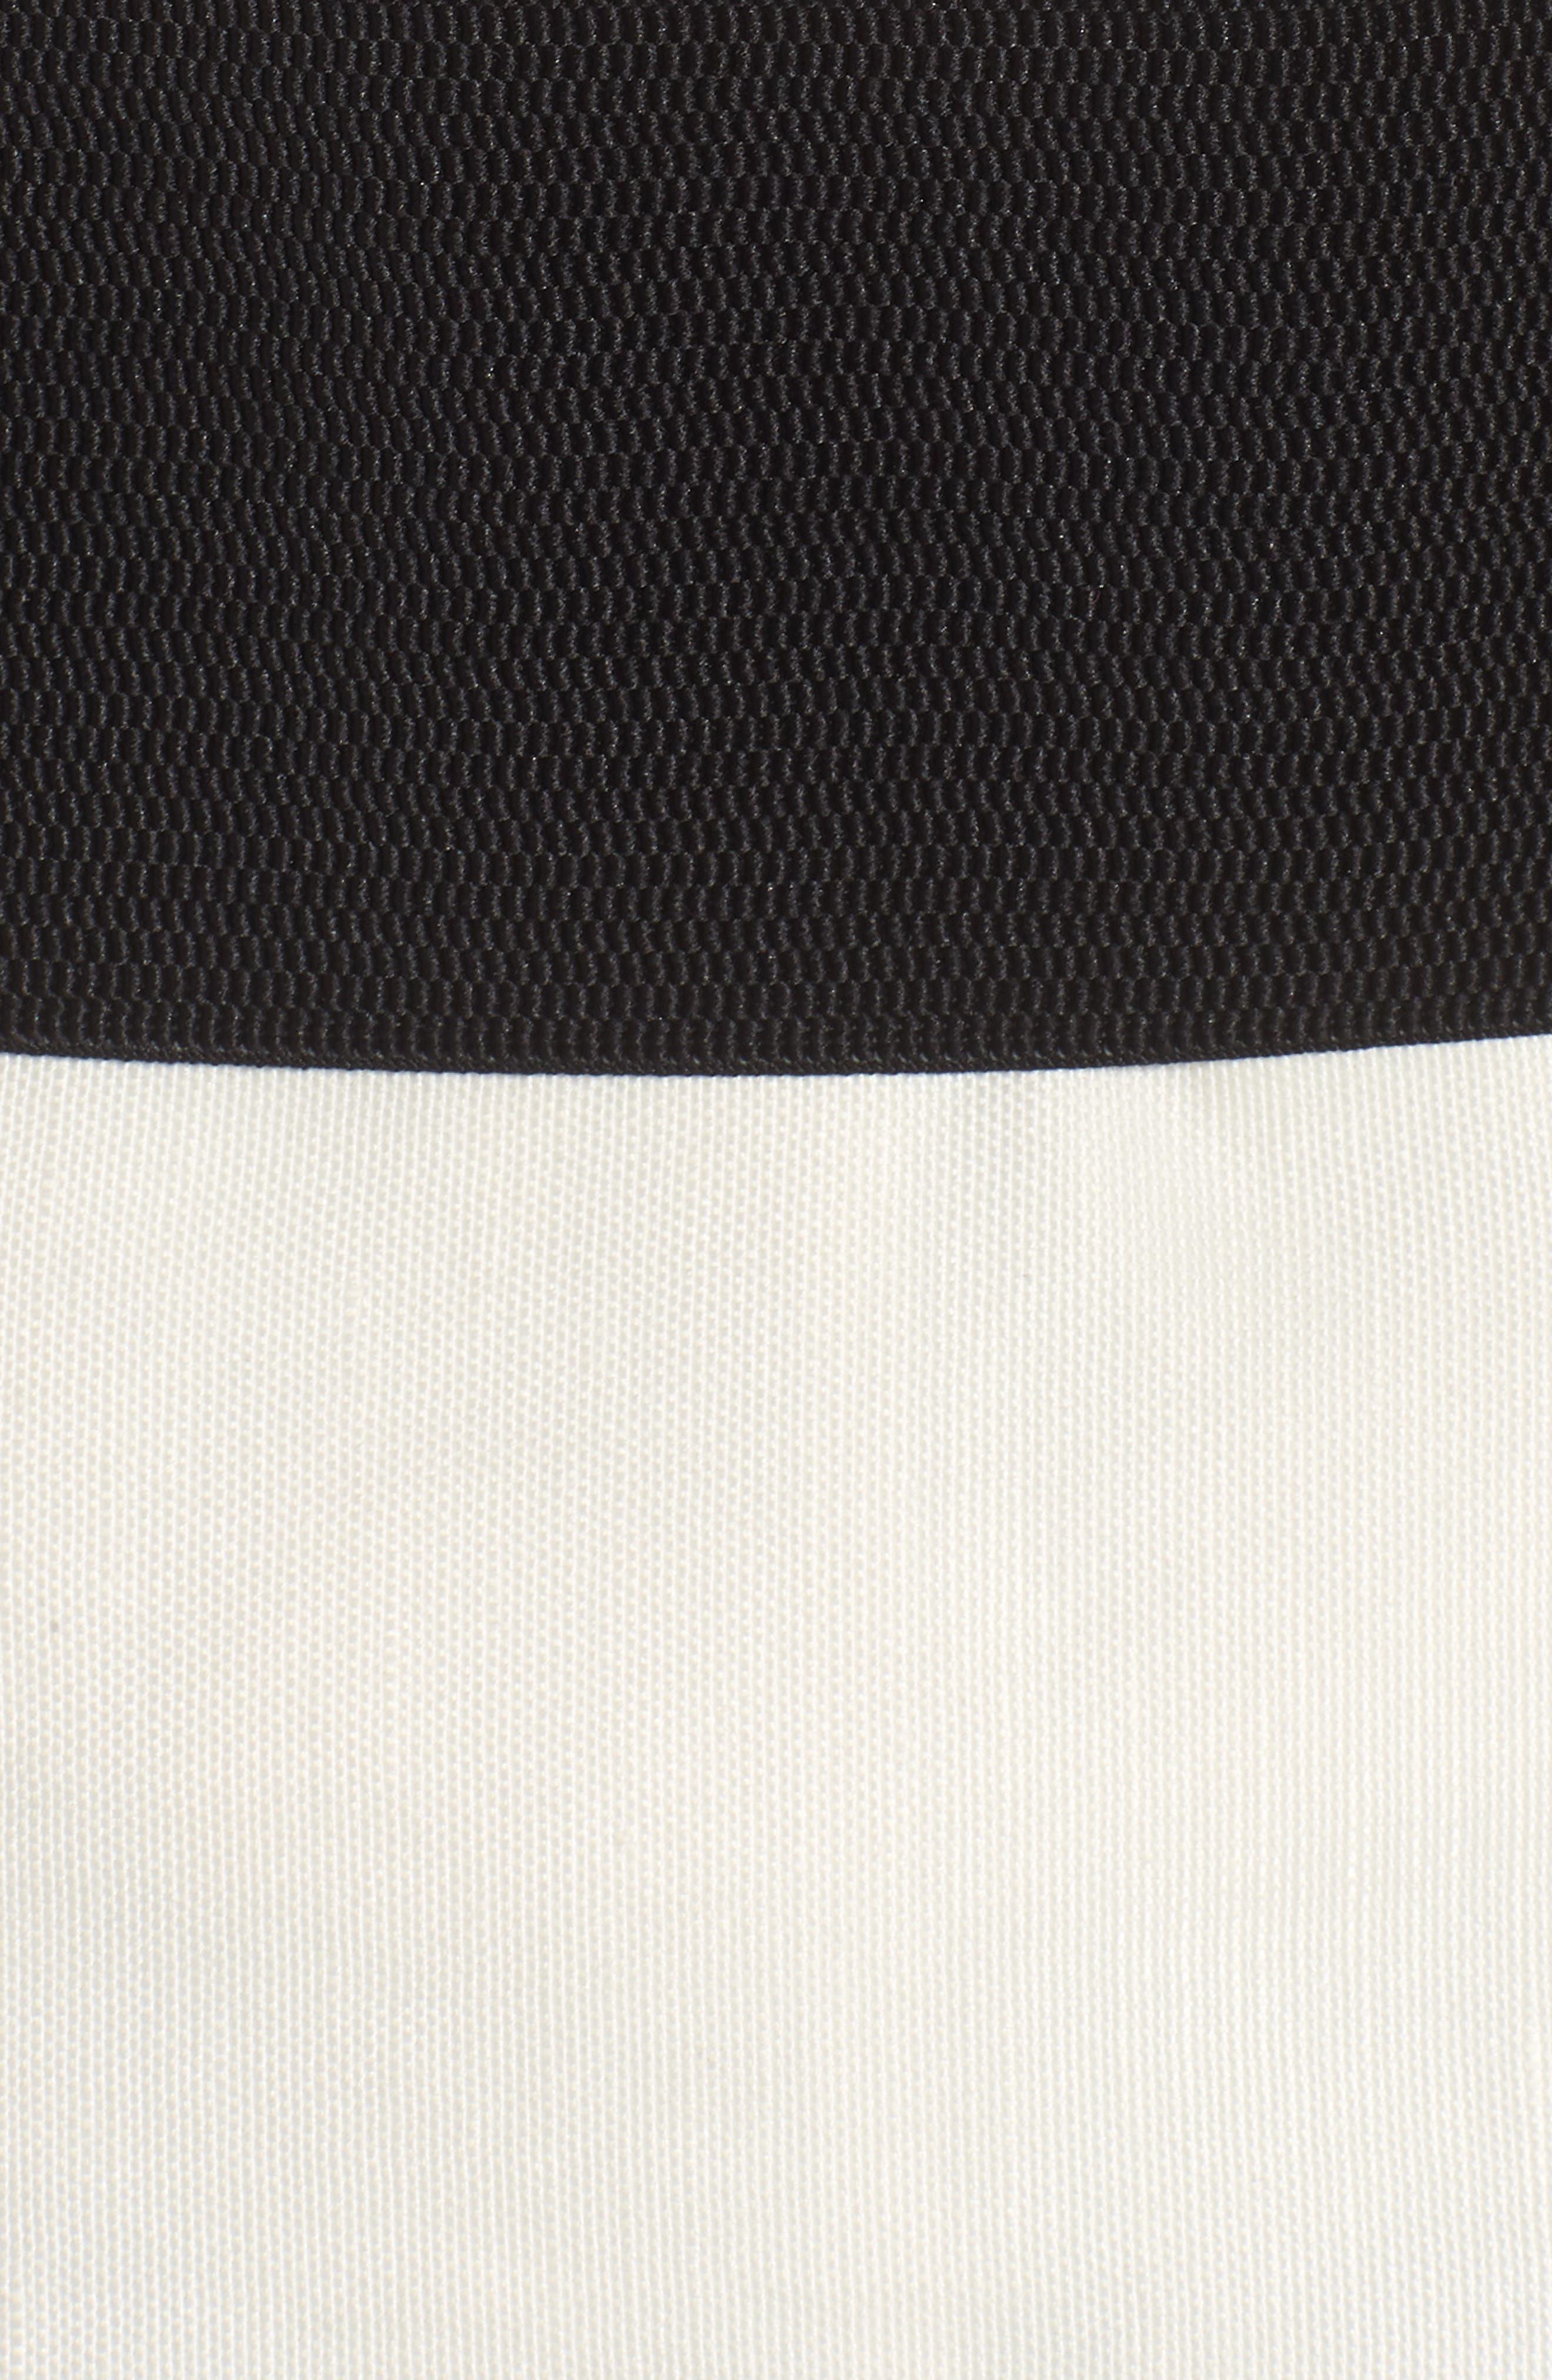 Corset Linen Blend Blazer,                             Alternate thumbnail 6, color,                             900